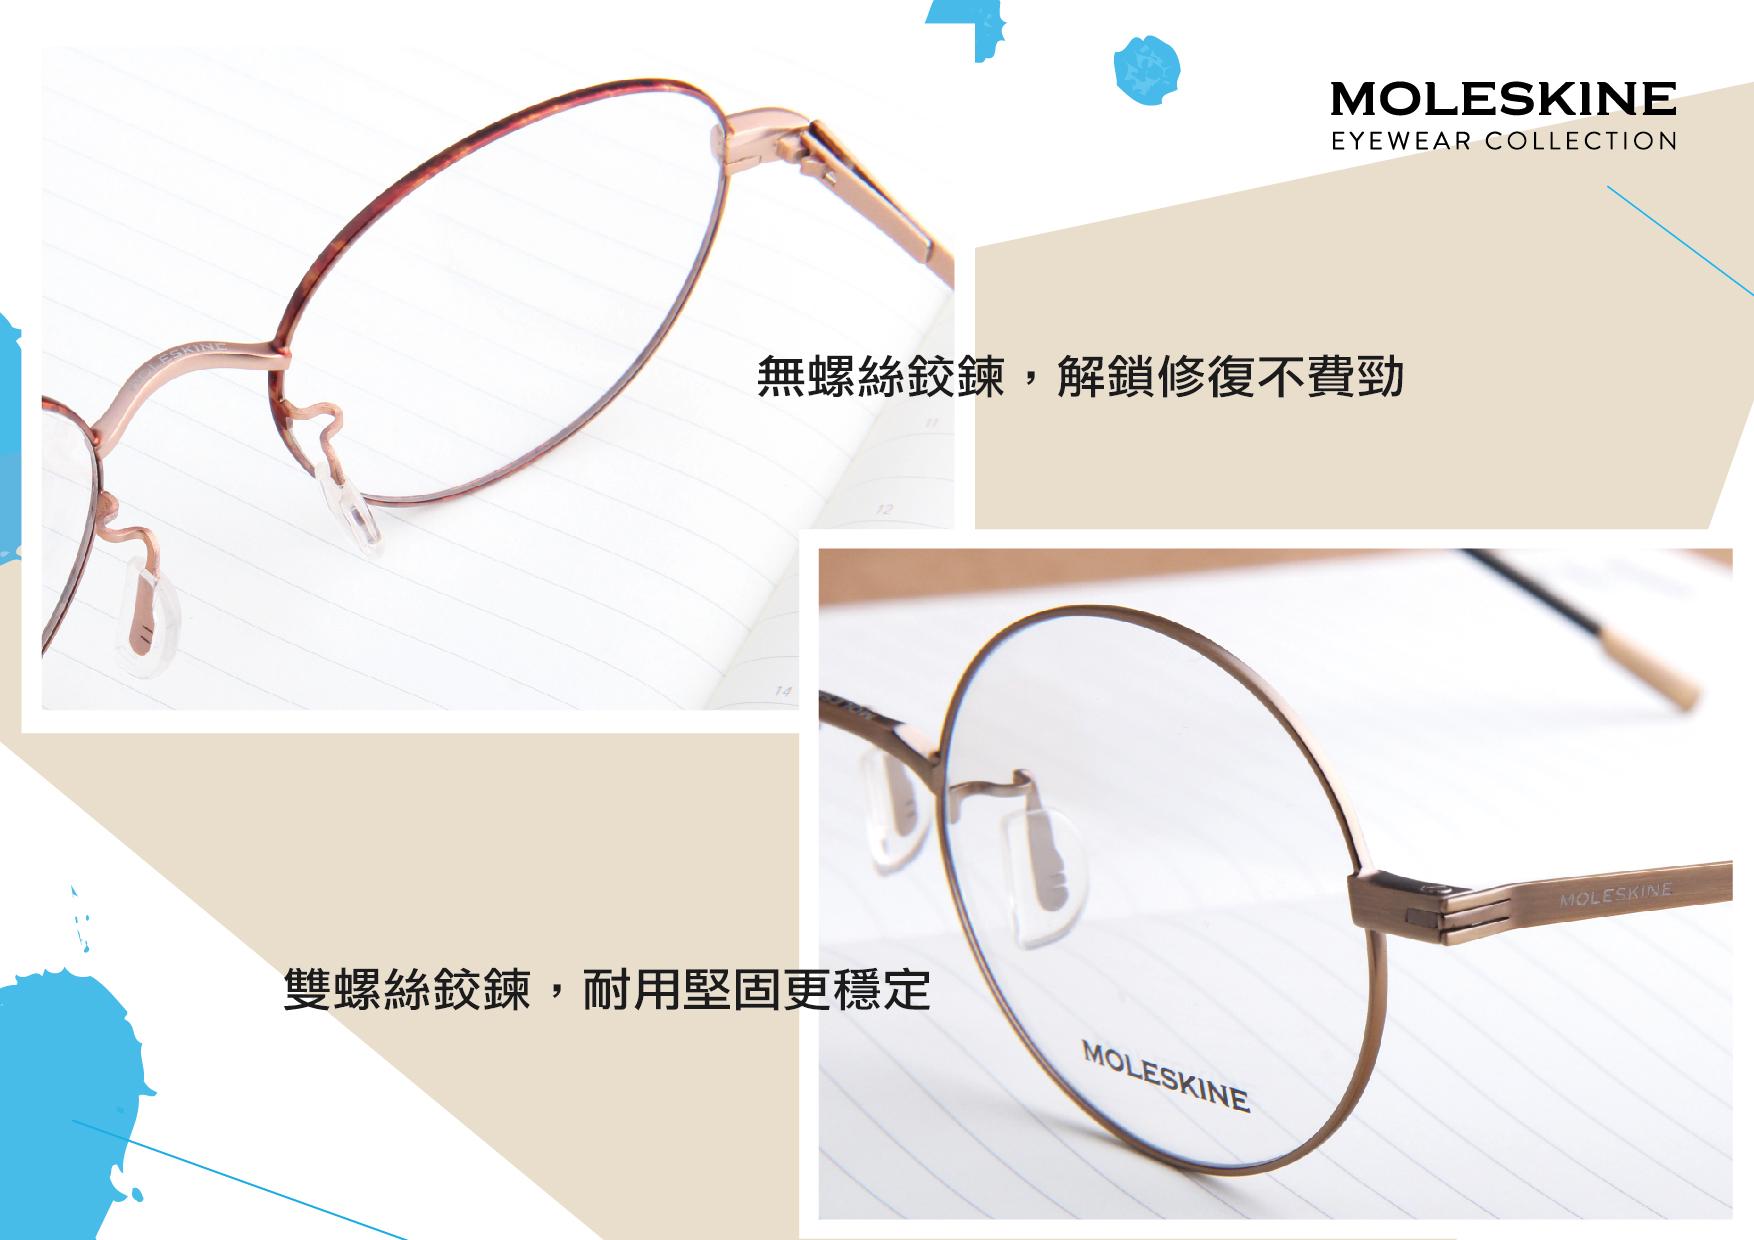 MOLESKINE-01